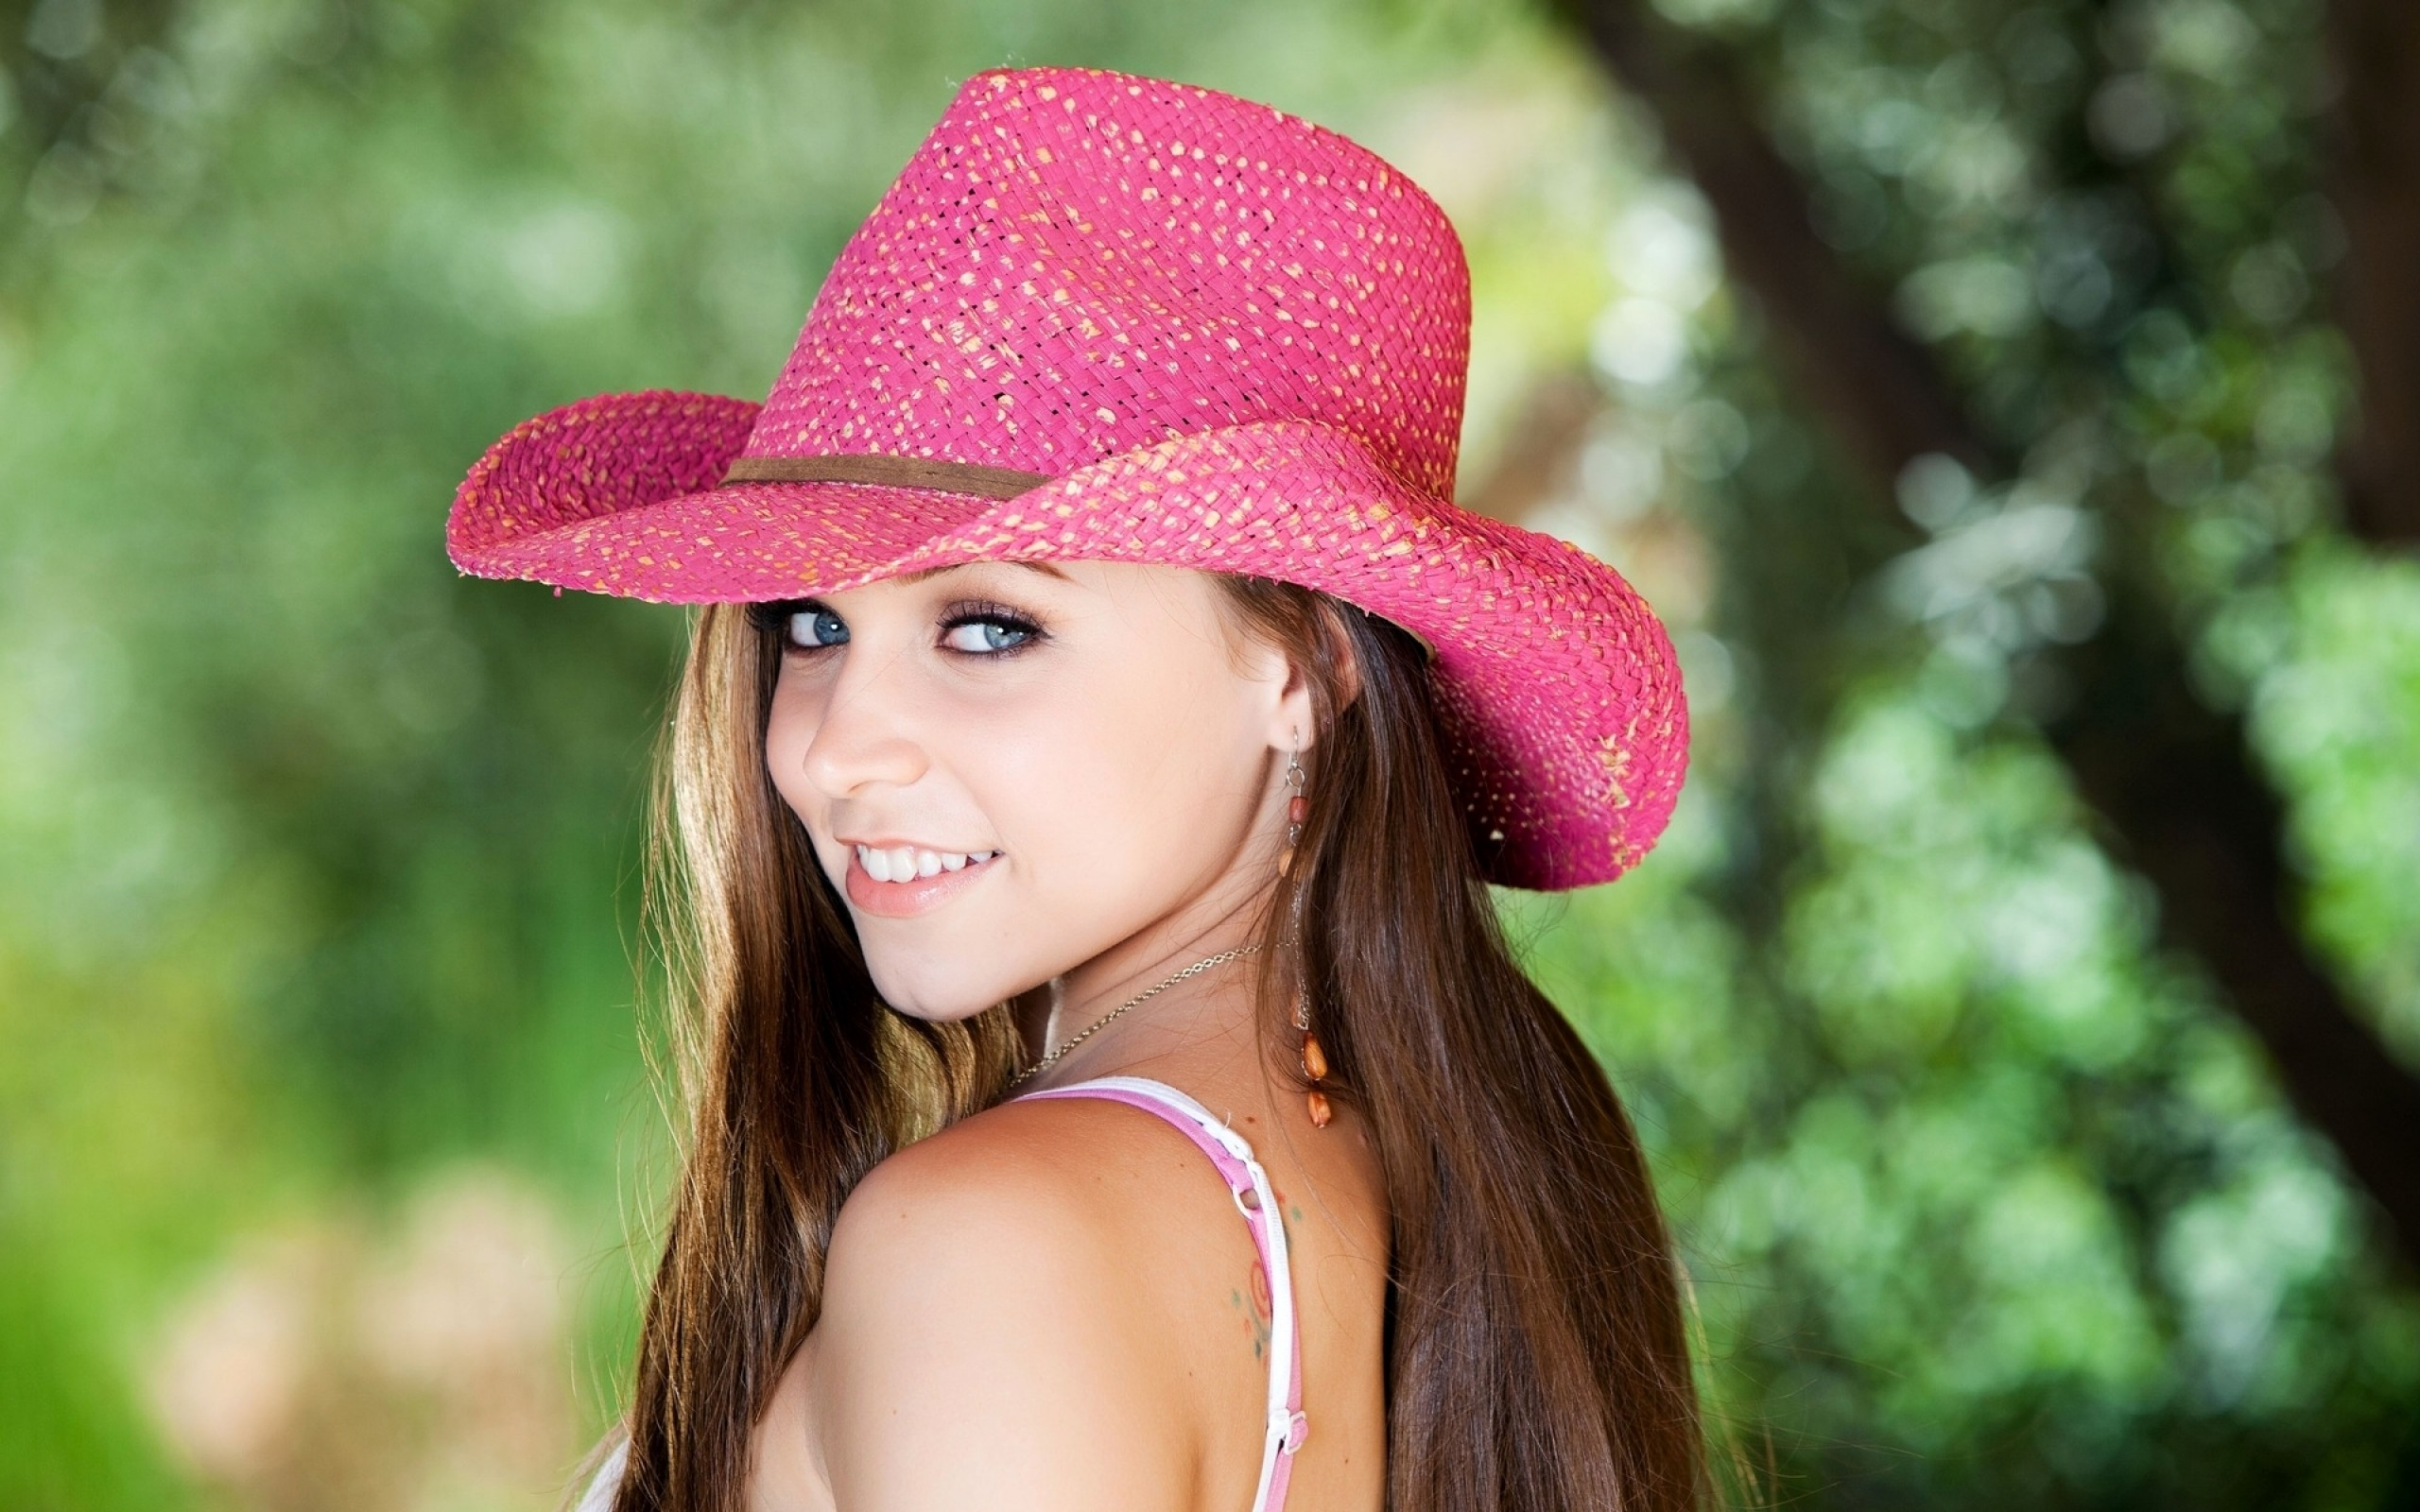 Chica con sombrero rosado - 2560x1600